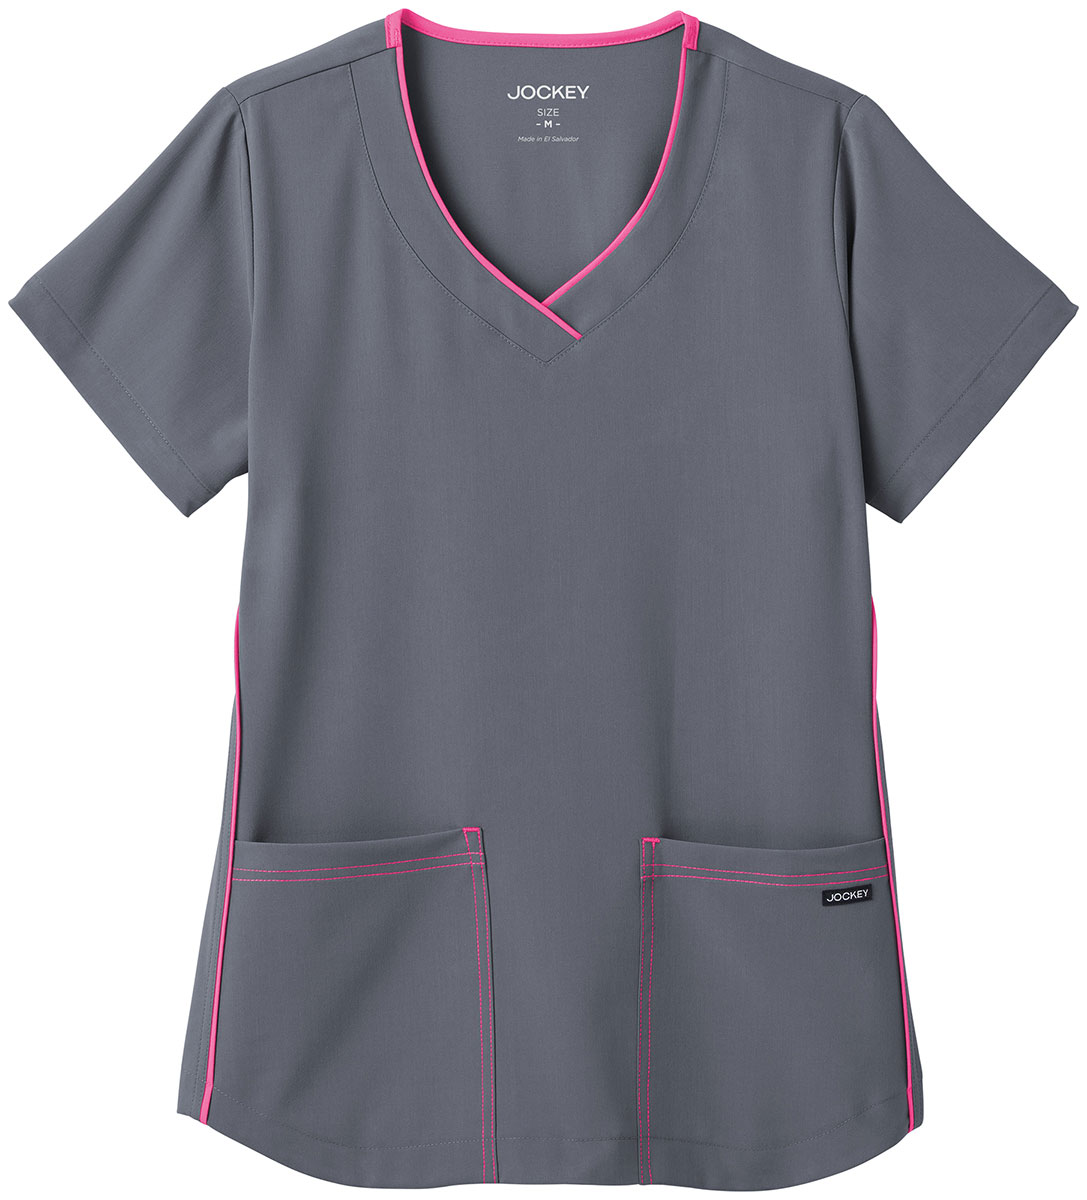 11a96ac4873 Jockey Scrubs Women's Short Sleeve Sporty V Neck Scrub Top. 2339   eBay